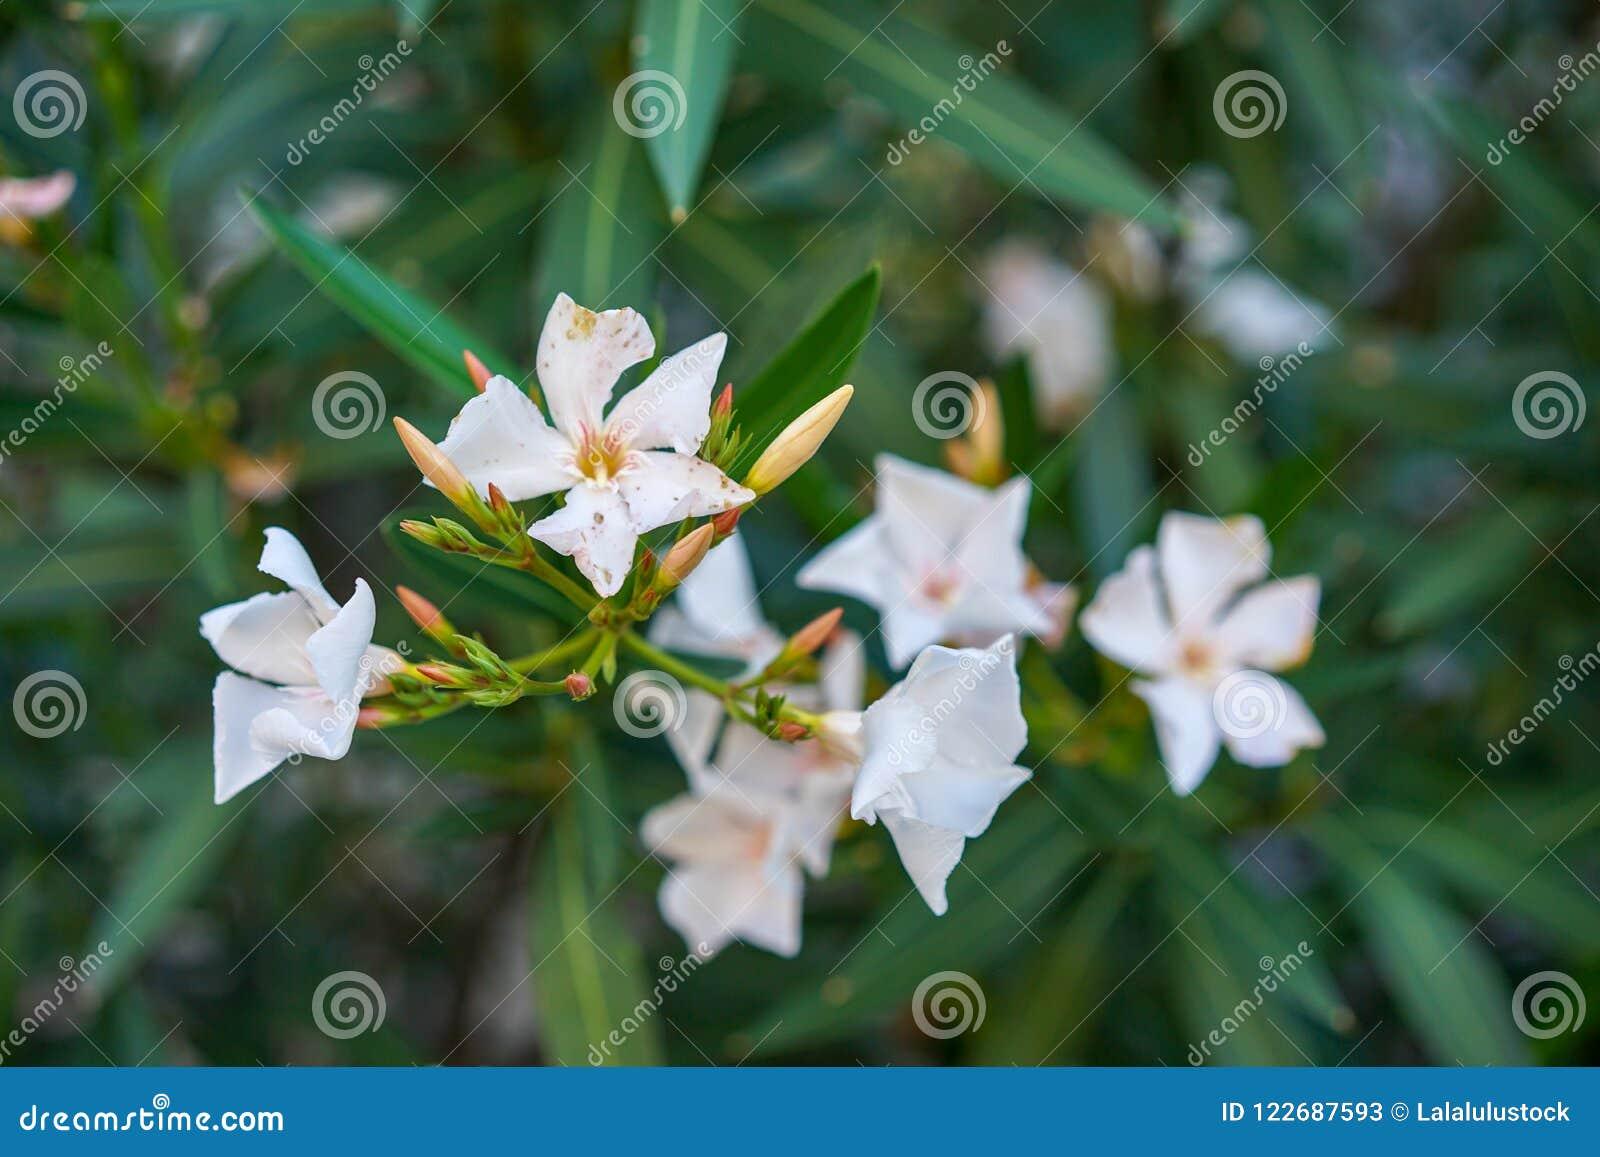 White Oleander Flowers Nerium Oleander From The Mediterranean Sea